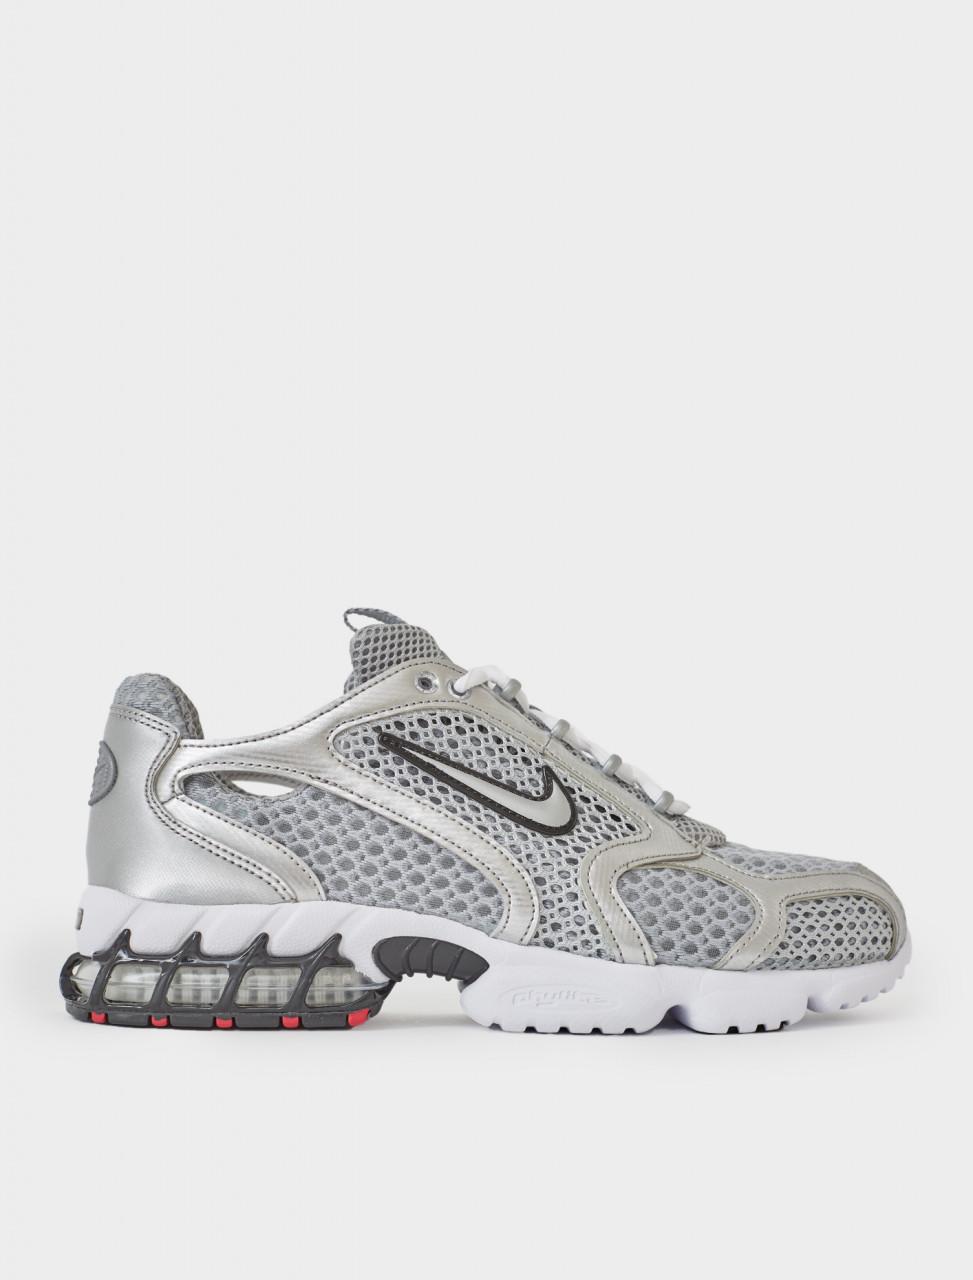 Men's Air Zoom Spiridon Cage 2 Sneaker